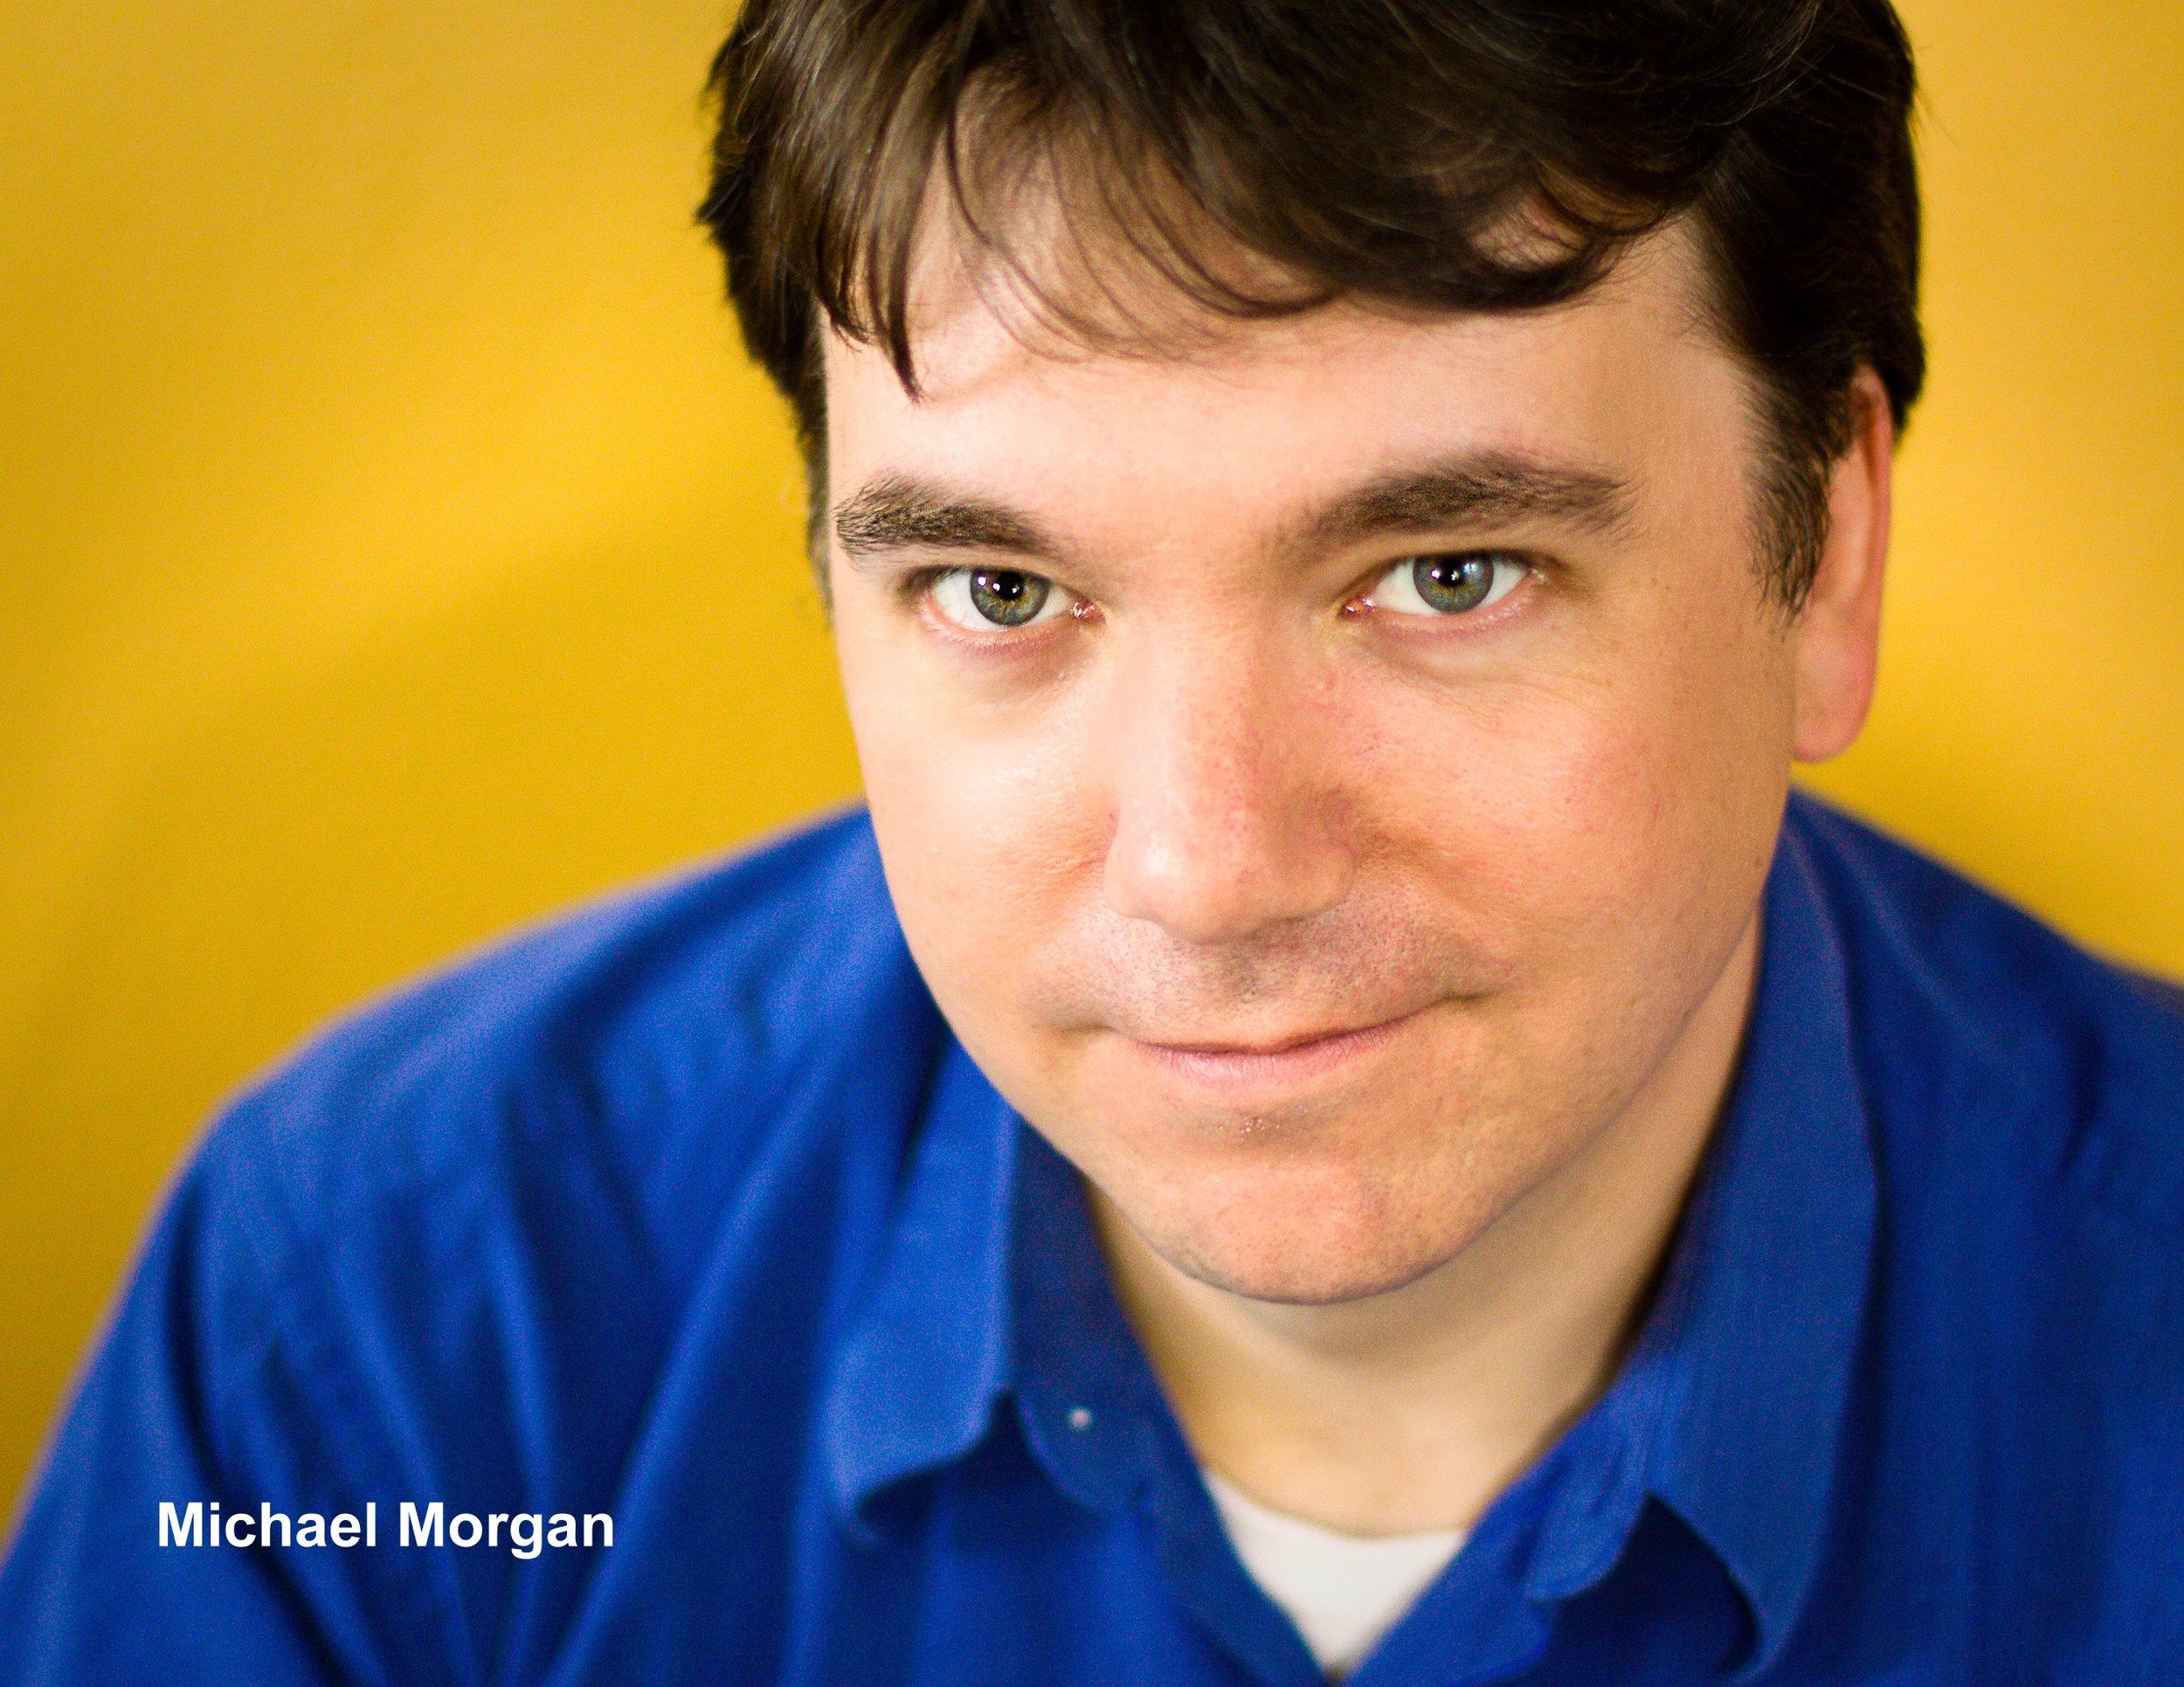 Michael Morgan* -            Normal  0          false  false  false    EN-US  JA  X-NONE                                                                                                                                                                                                                                                                                                                                             /* Style Definitions */ table.MsoNormalTable {mso-style-name: